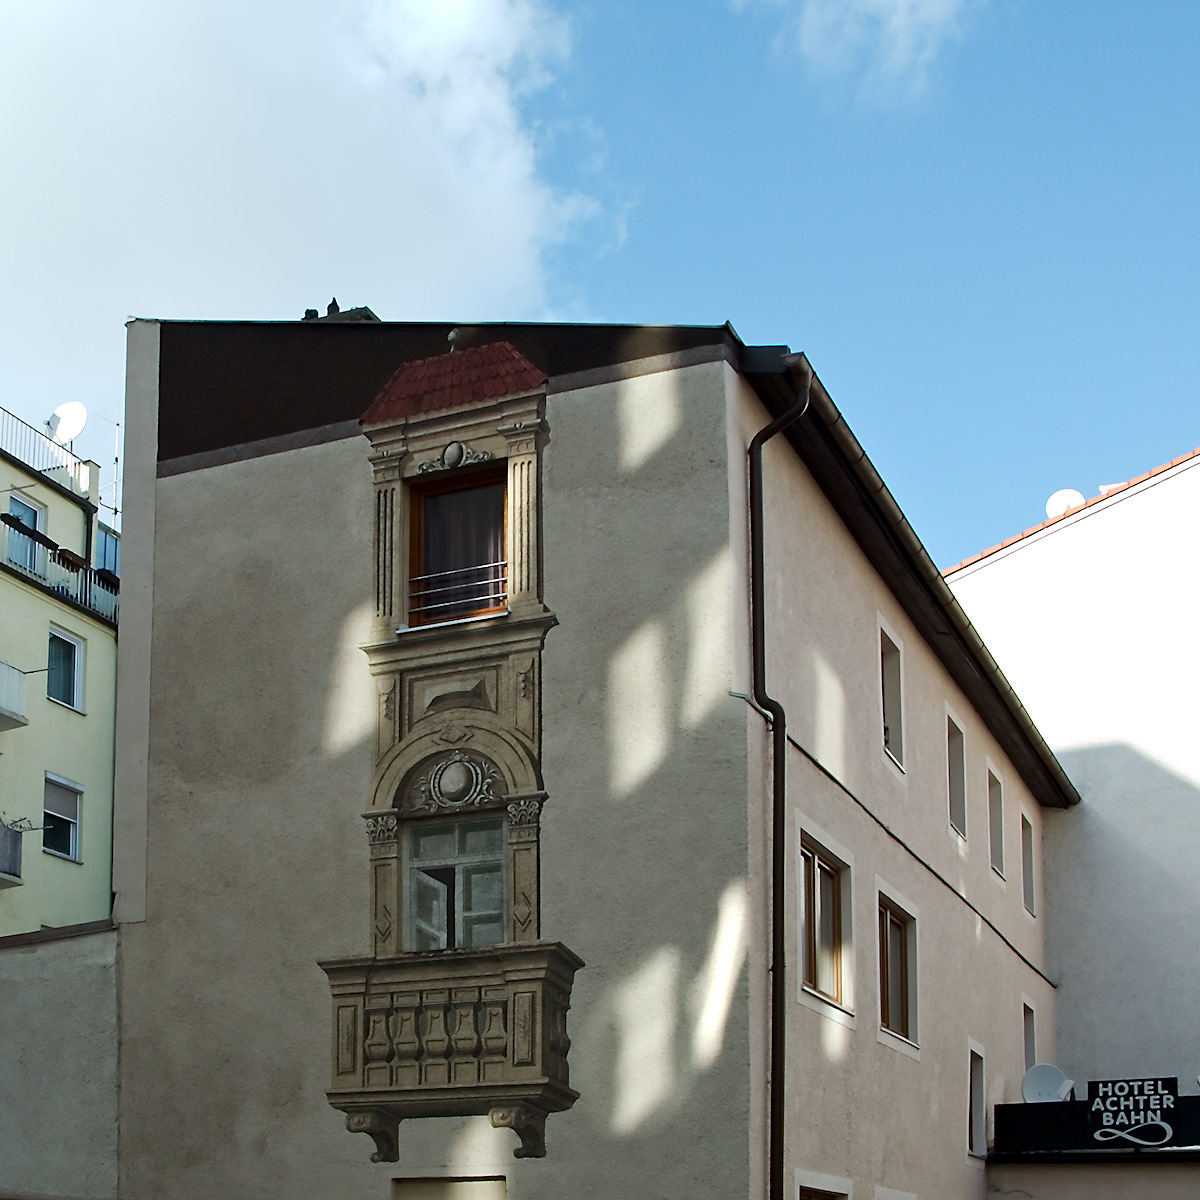 Click to enlarge: Backyard Trompe-l'oeil [f/5, 1/400 sec, 28mm-e, ISO 160, DMC-G3]